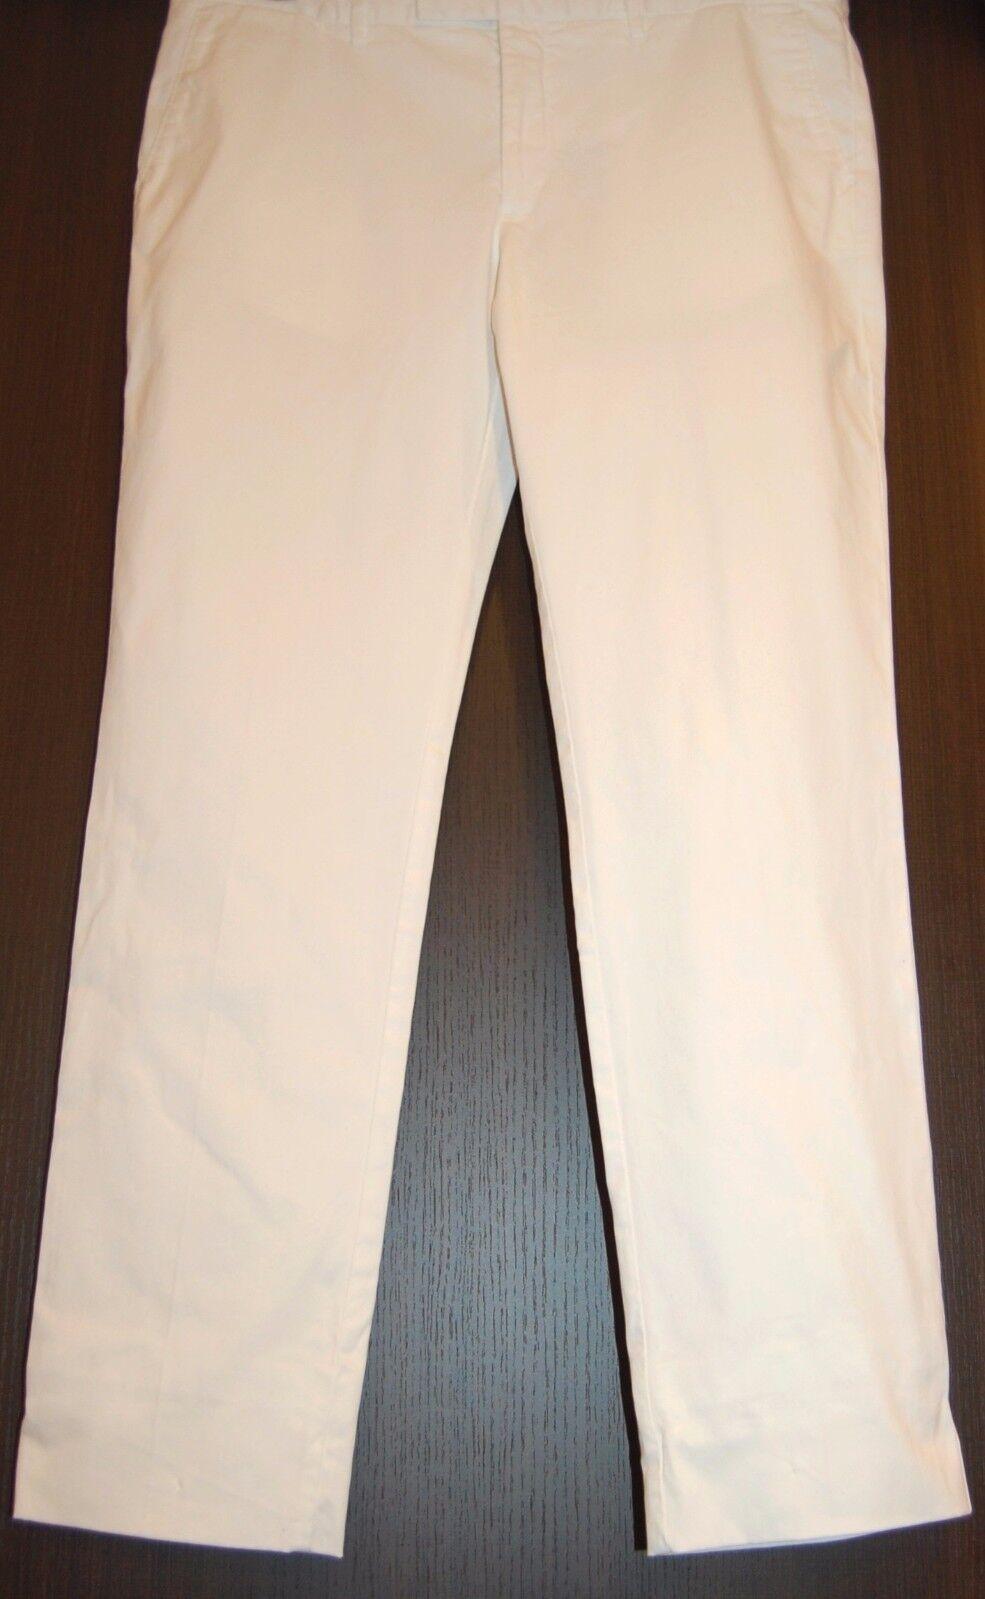 Emporio Armani White Cotton Men's Casual  Pants Trouser Sz US 40 UE 56